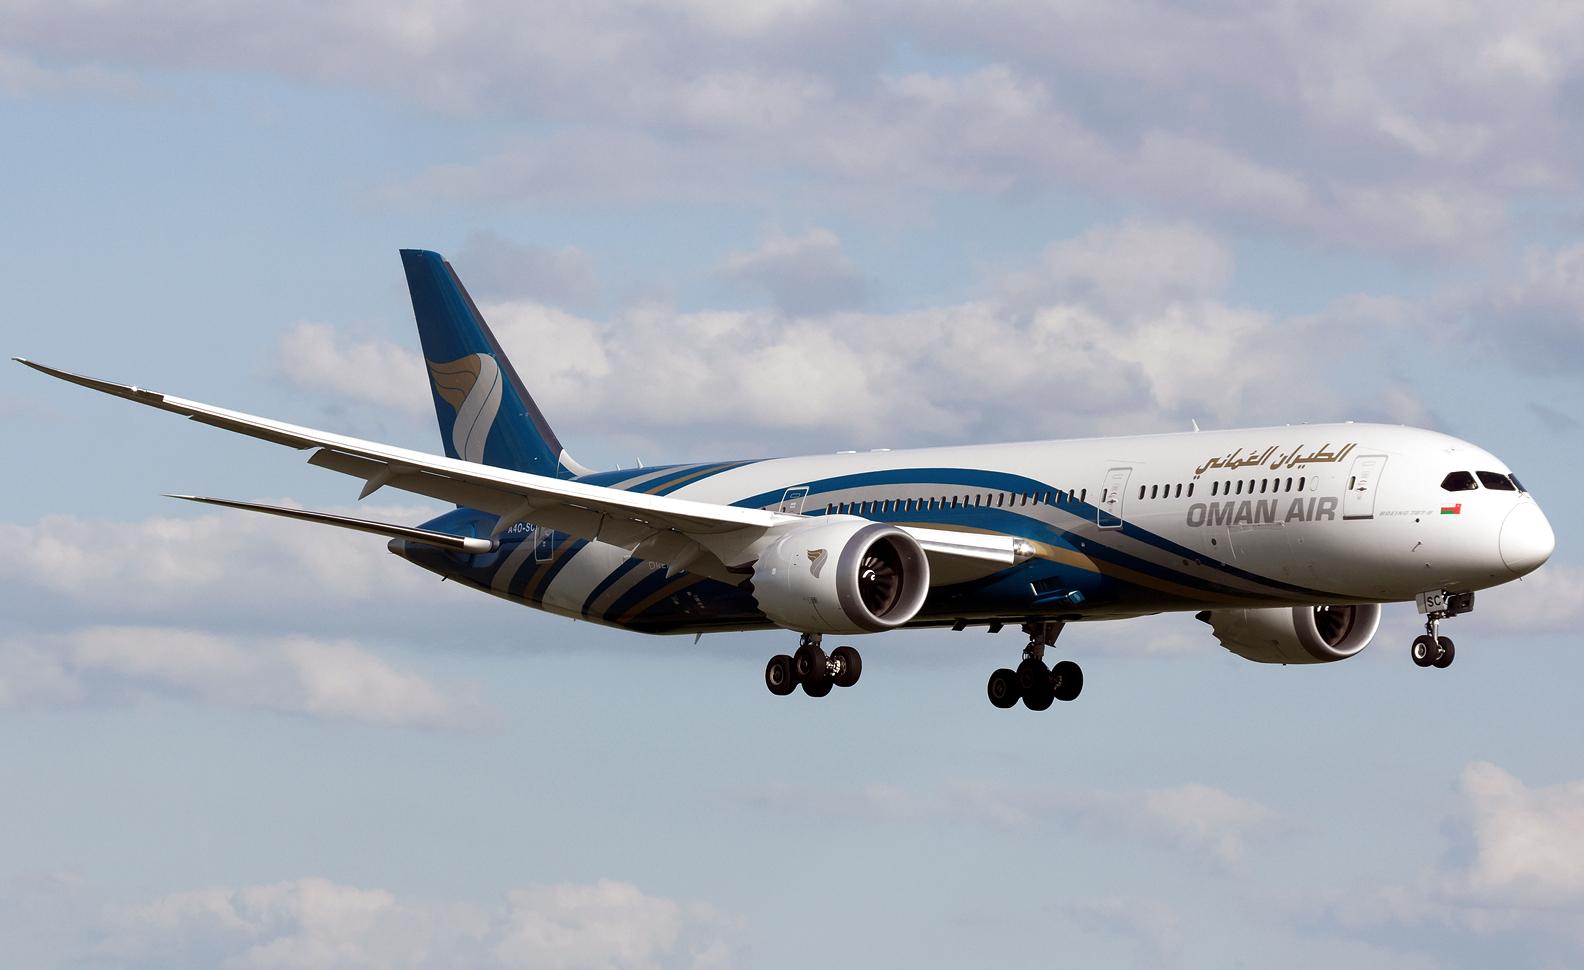 Oman Air Boeing 787-9 Dreamliner Apprroaching Landing